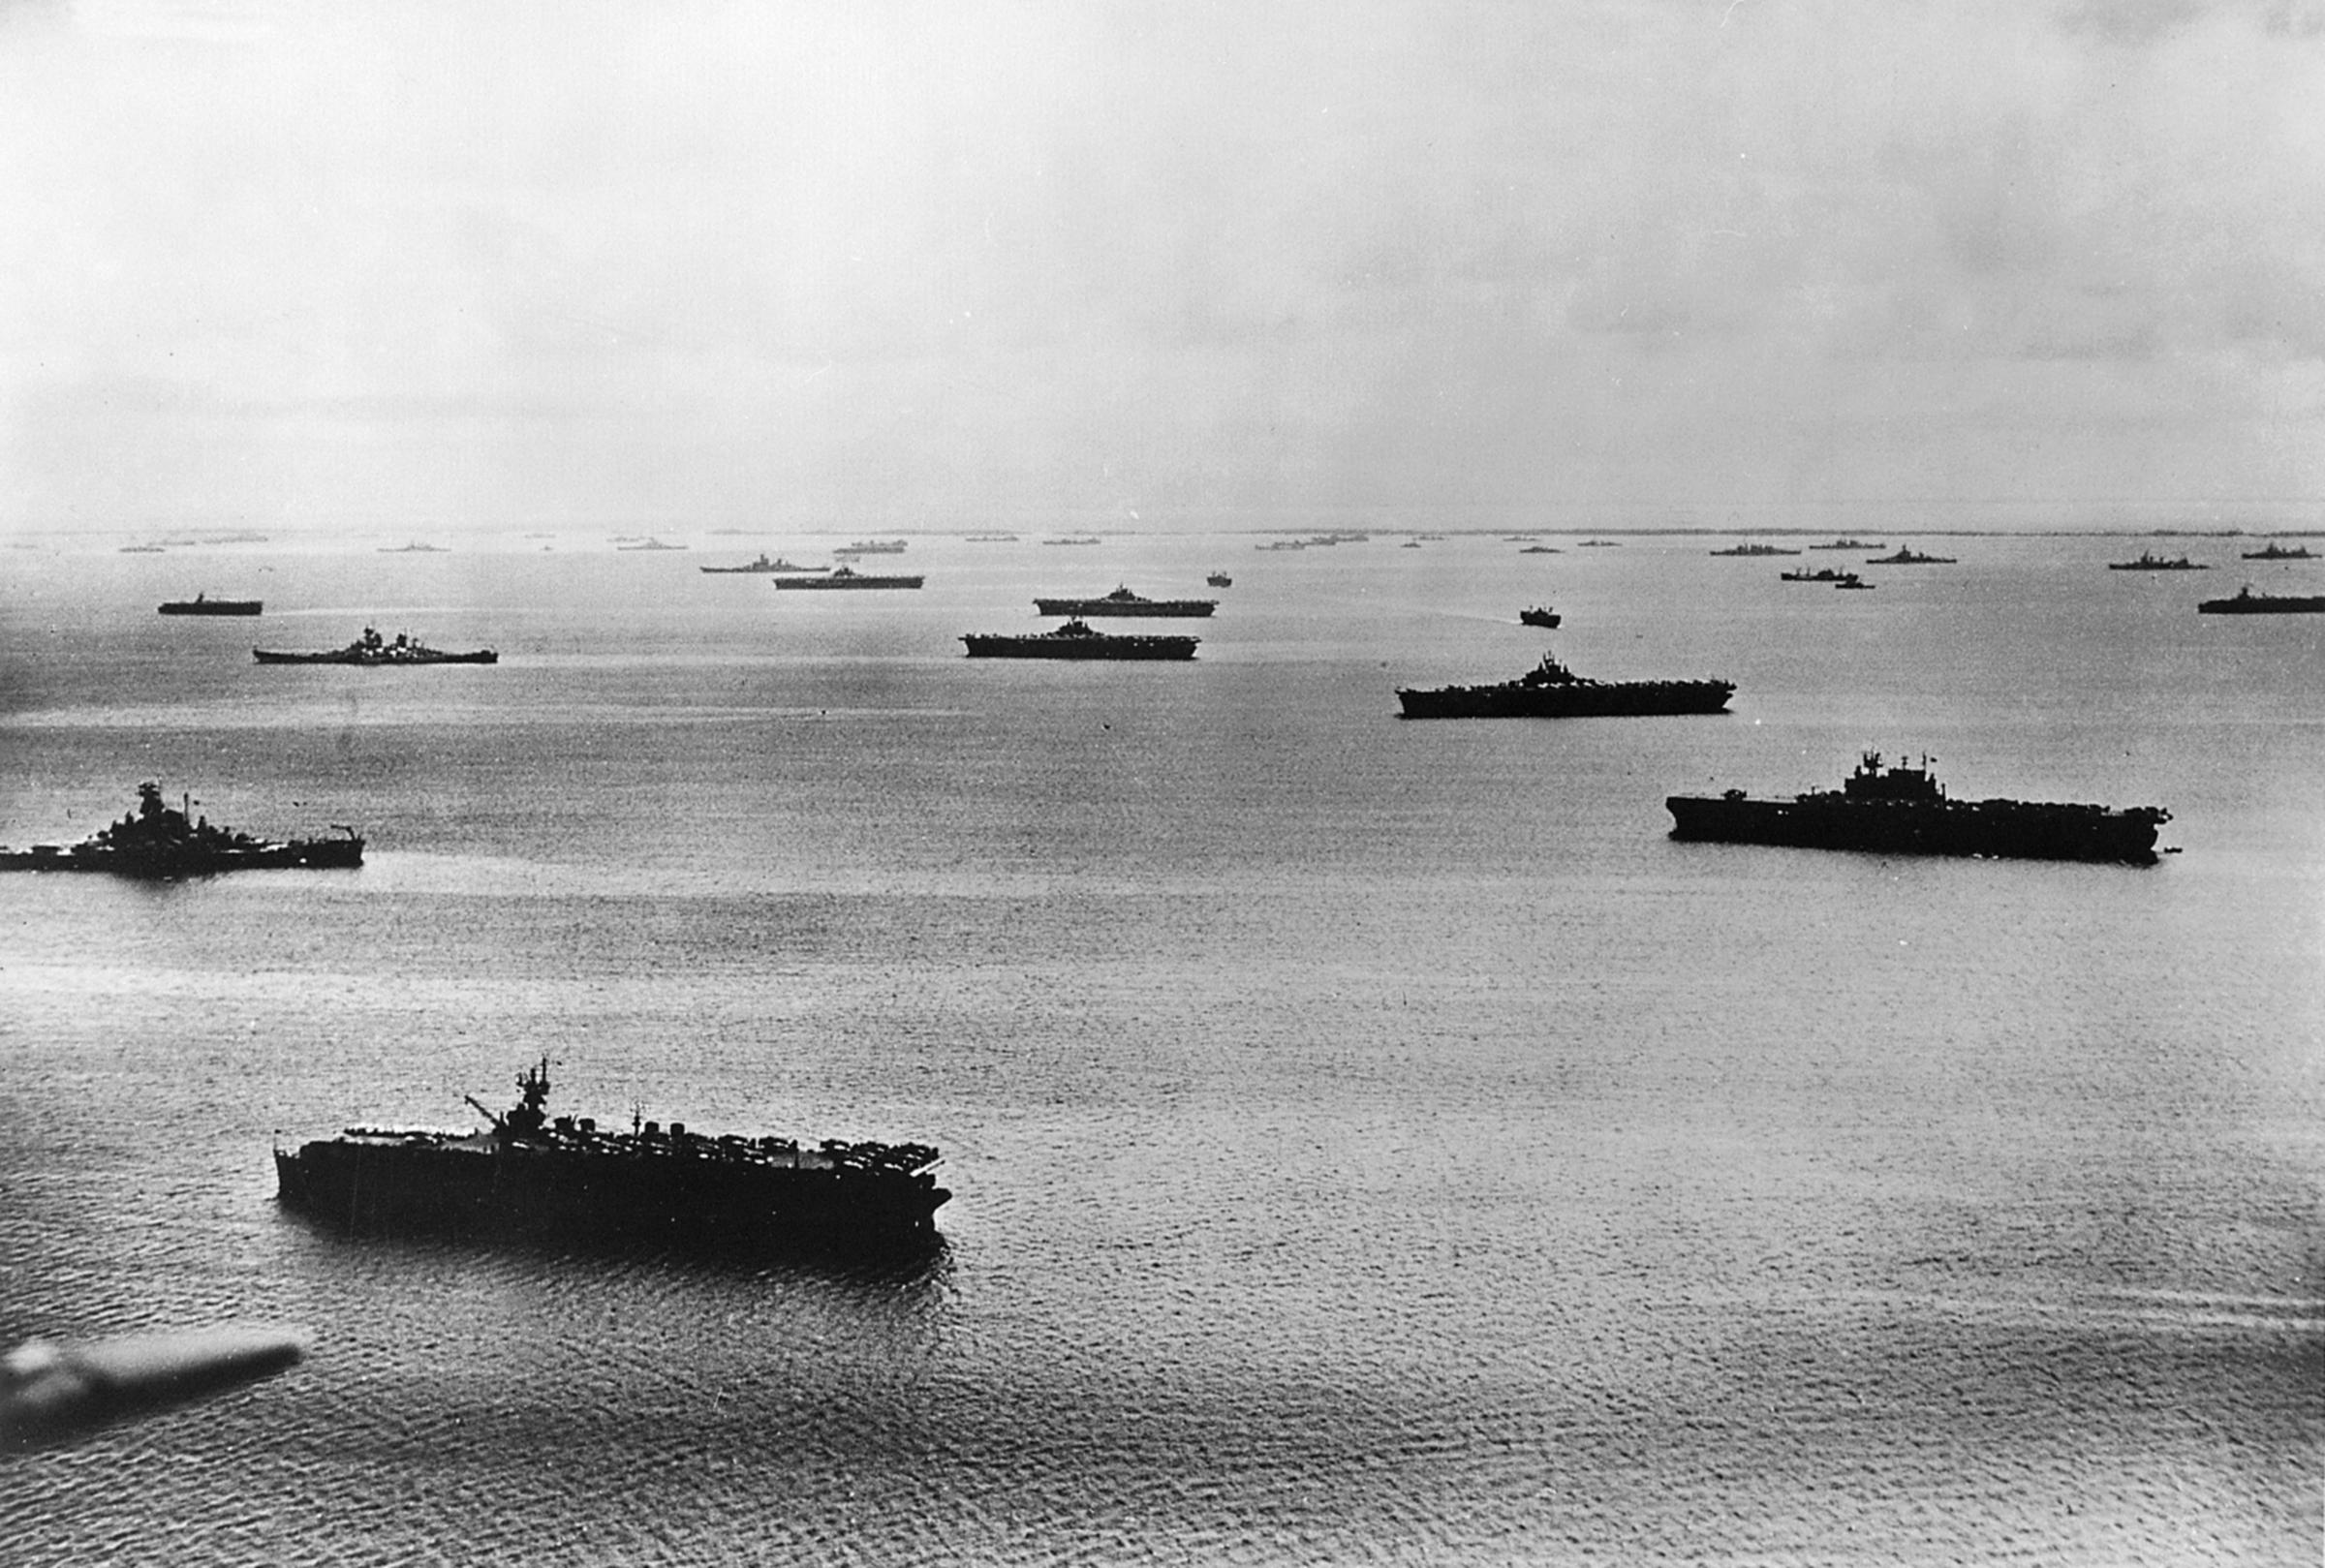 Resultado de imagen de saipan 1944 fleet